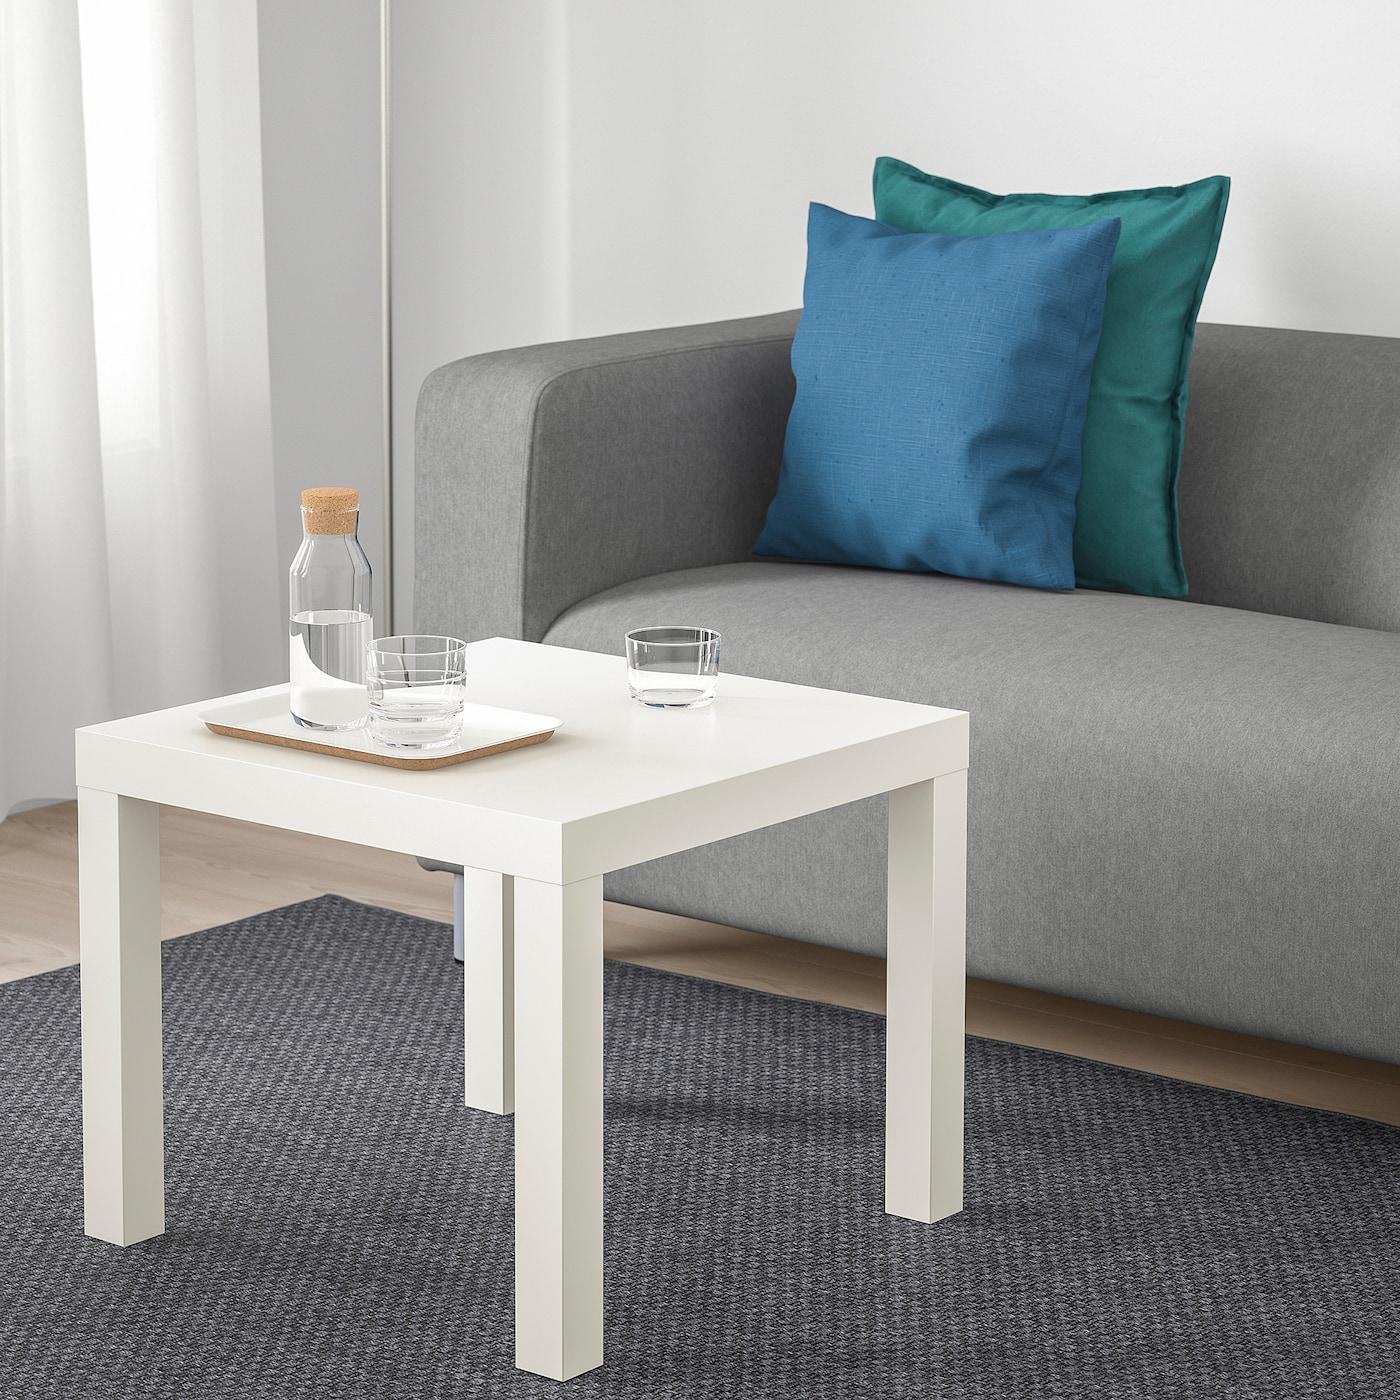 Lack Odkladaci Stolek Bila 55x55 Cm Ikea [ 1400 x 1400 Pixel ]